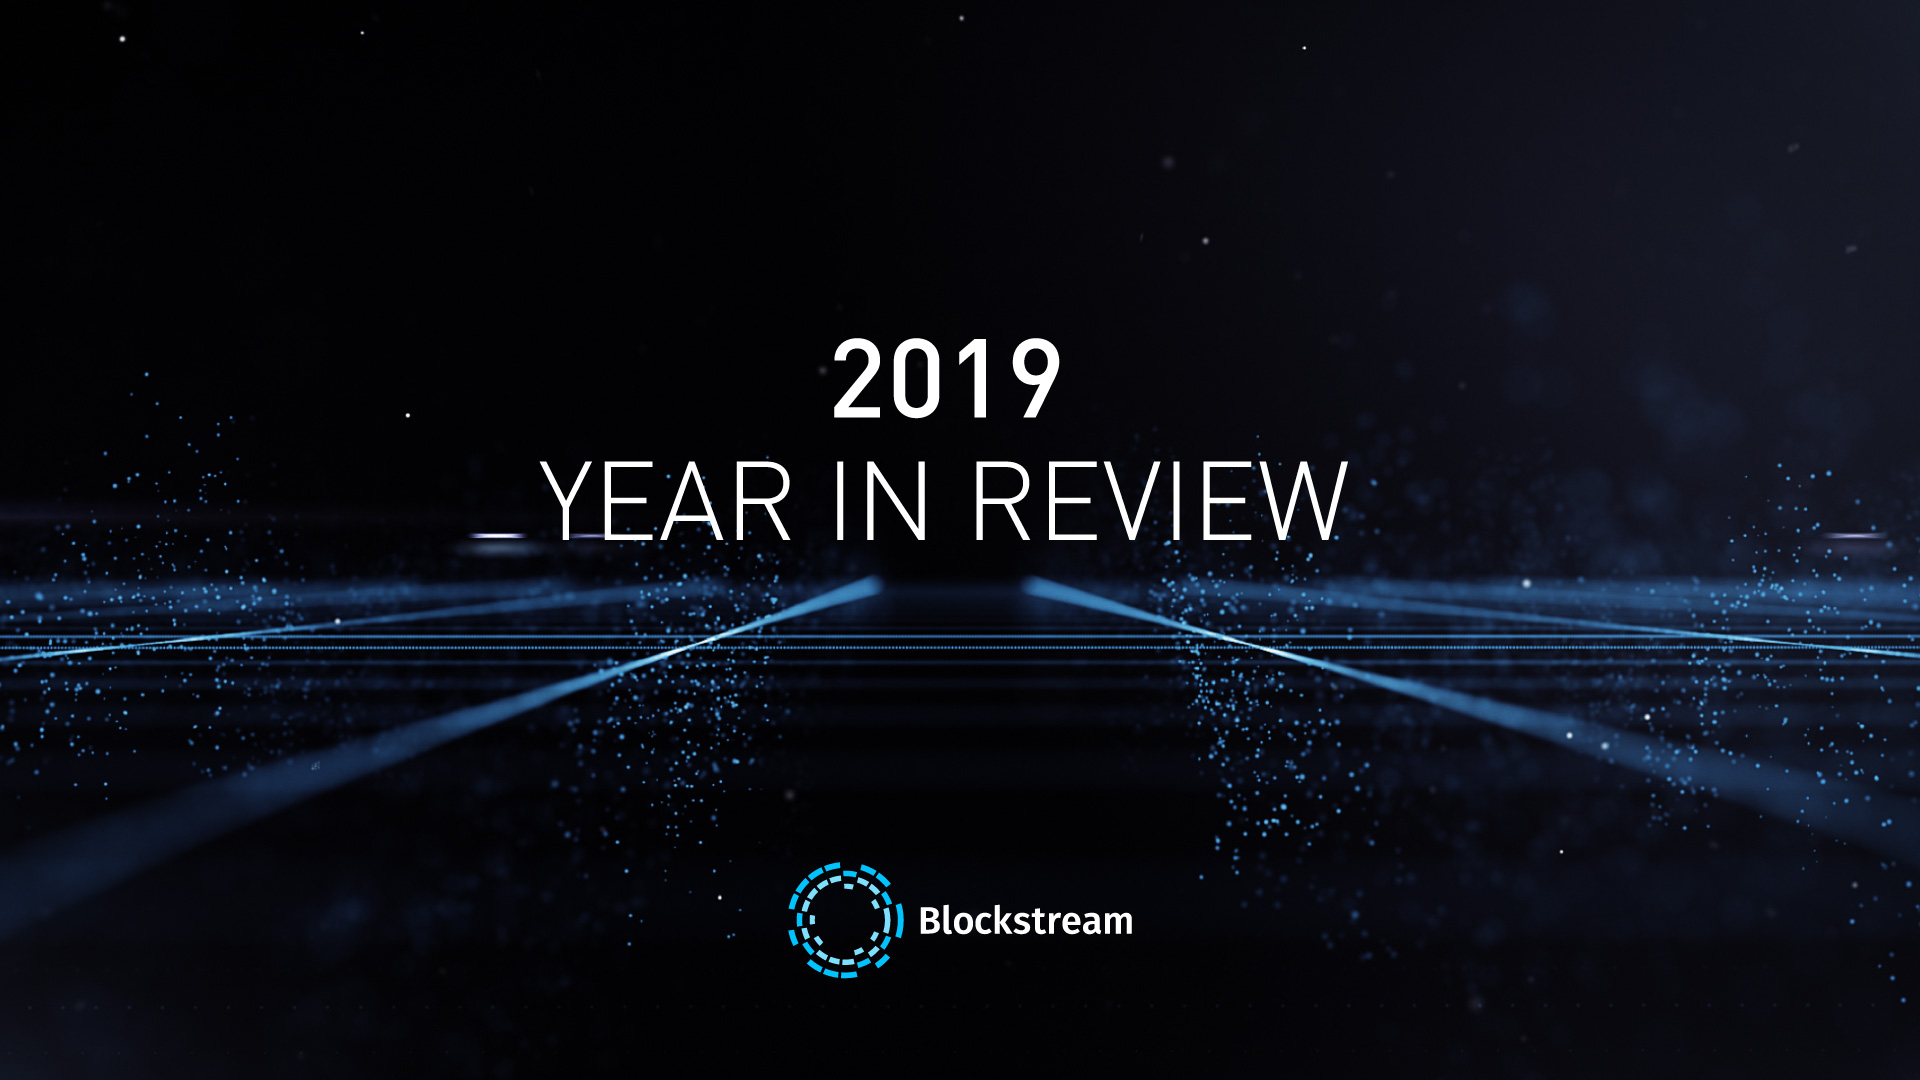 Blockstream 2019 Review: Building Foundations